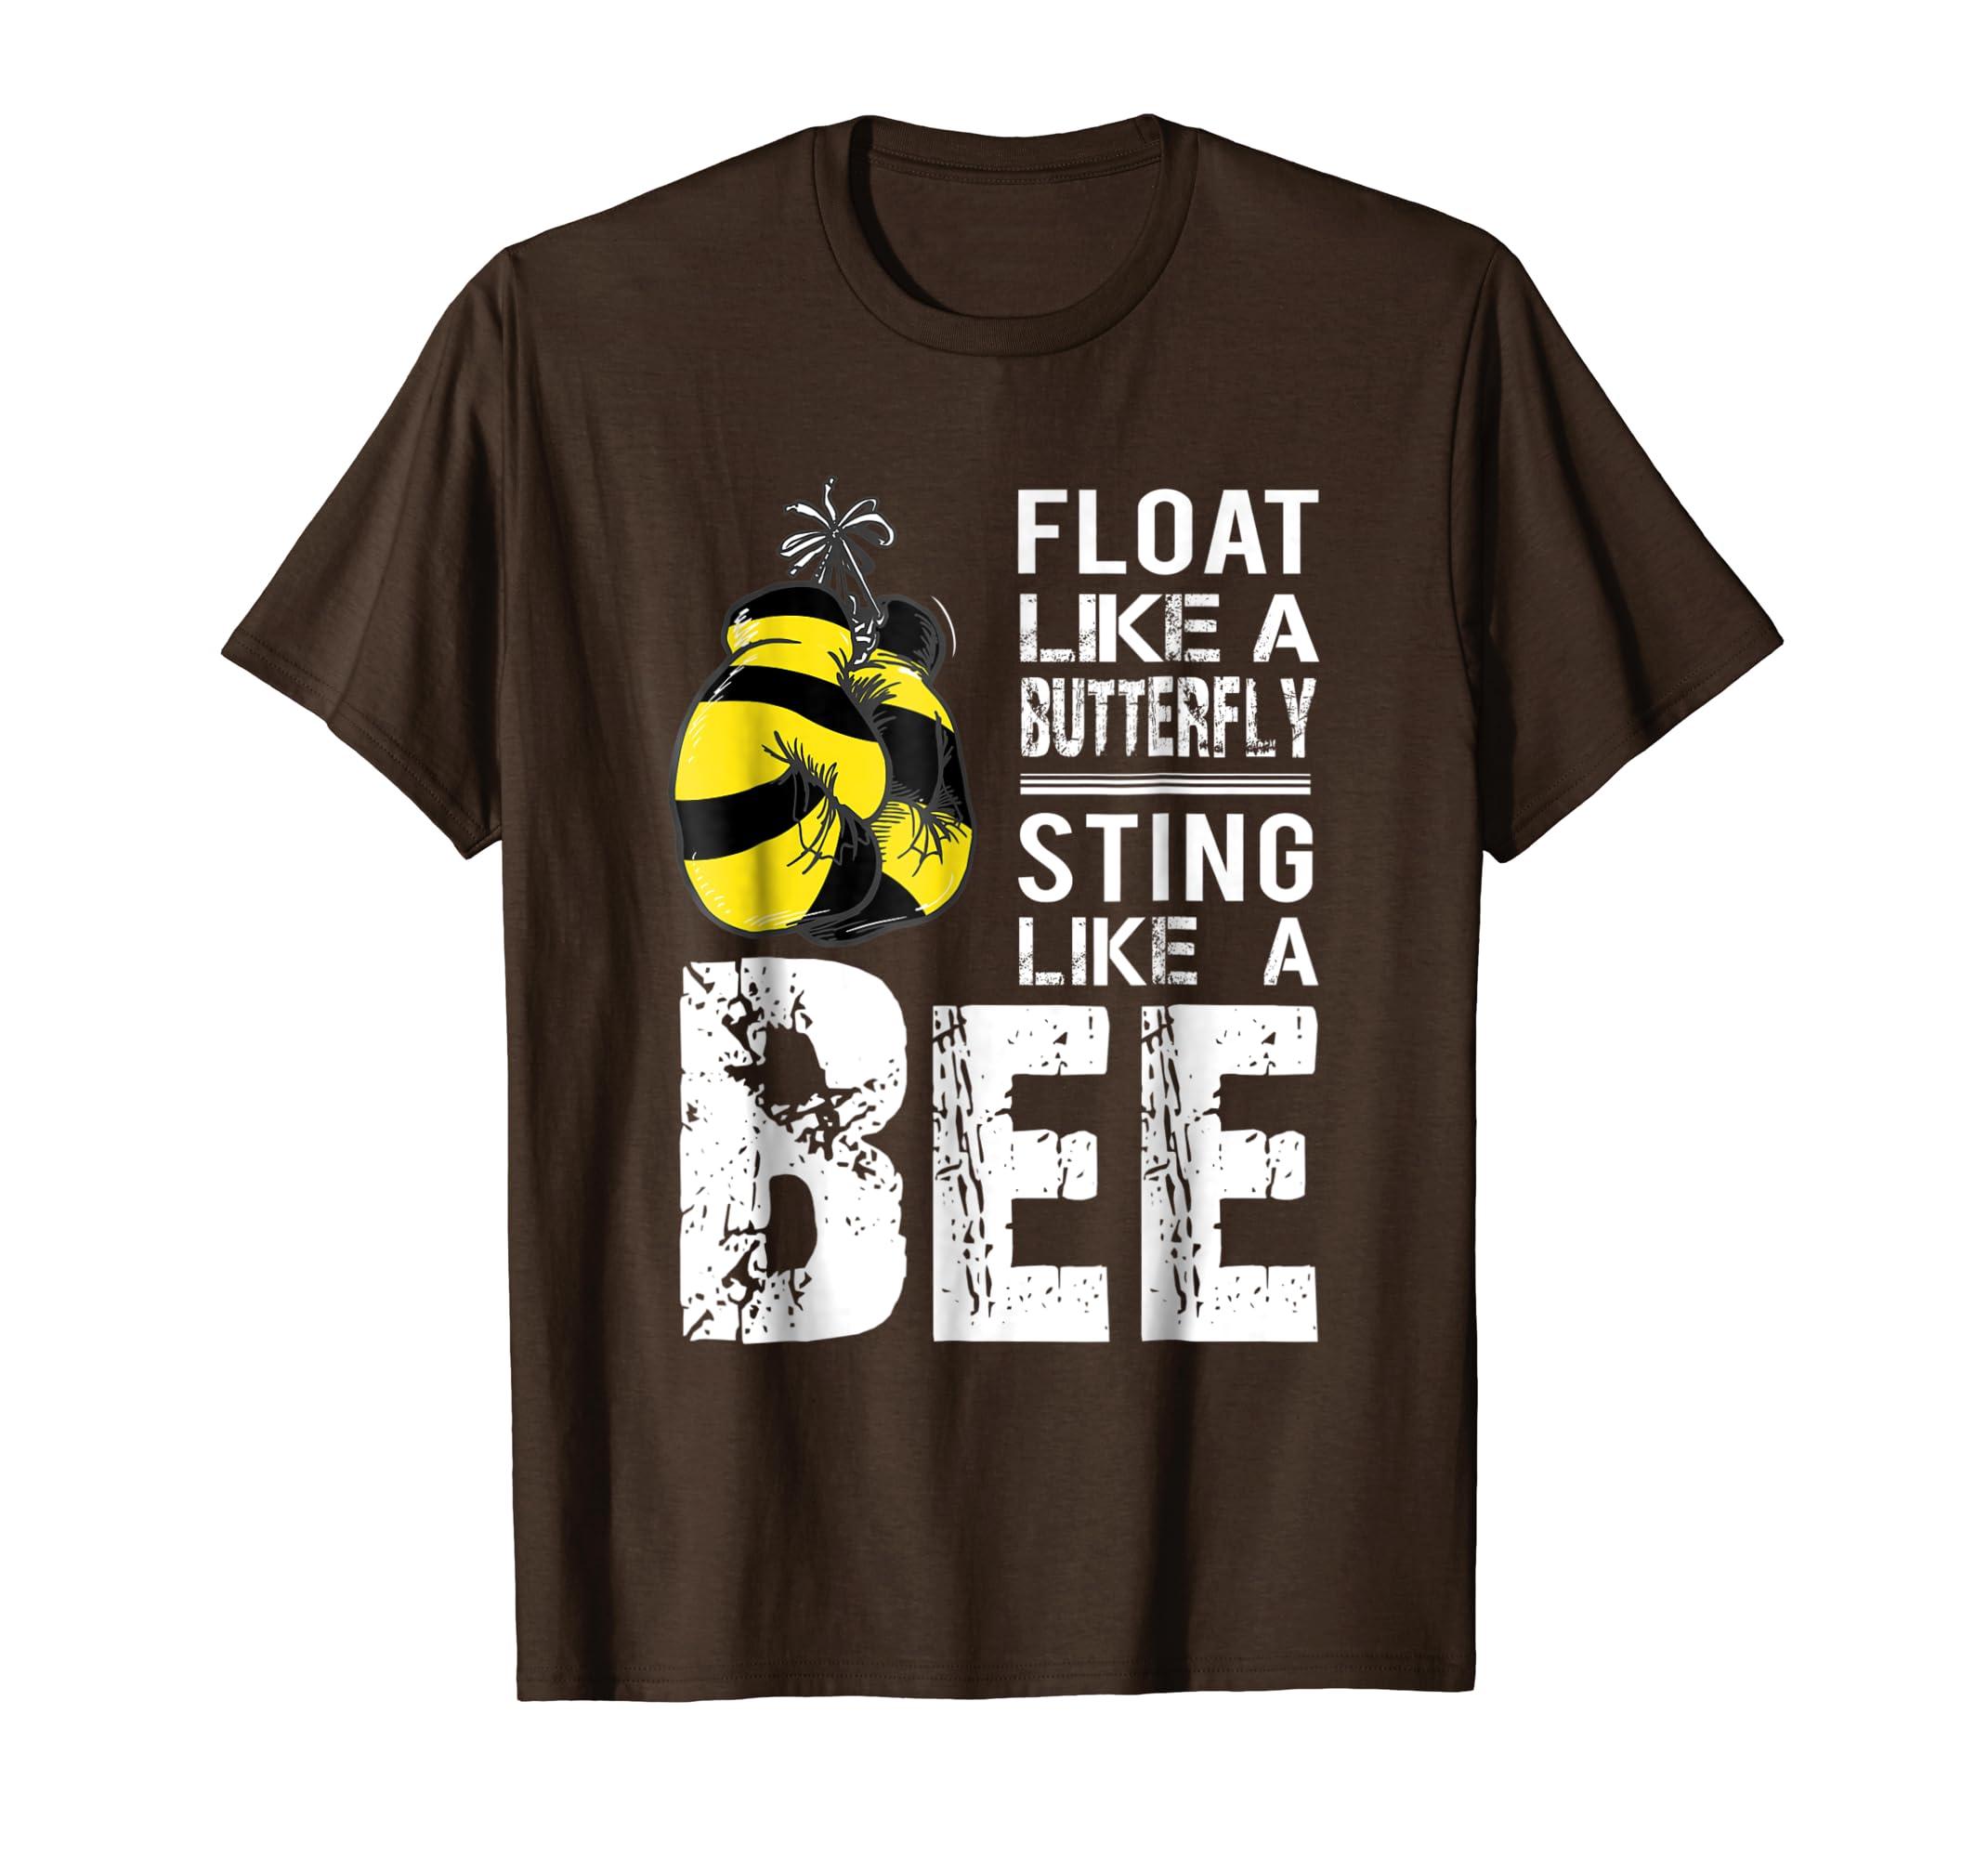 float like a butterfly sting like a bee t shirt-Teesml